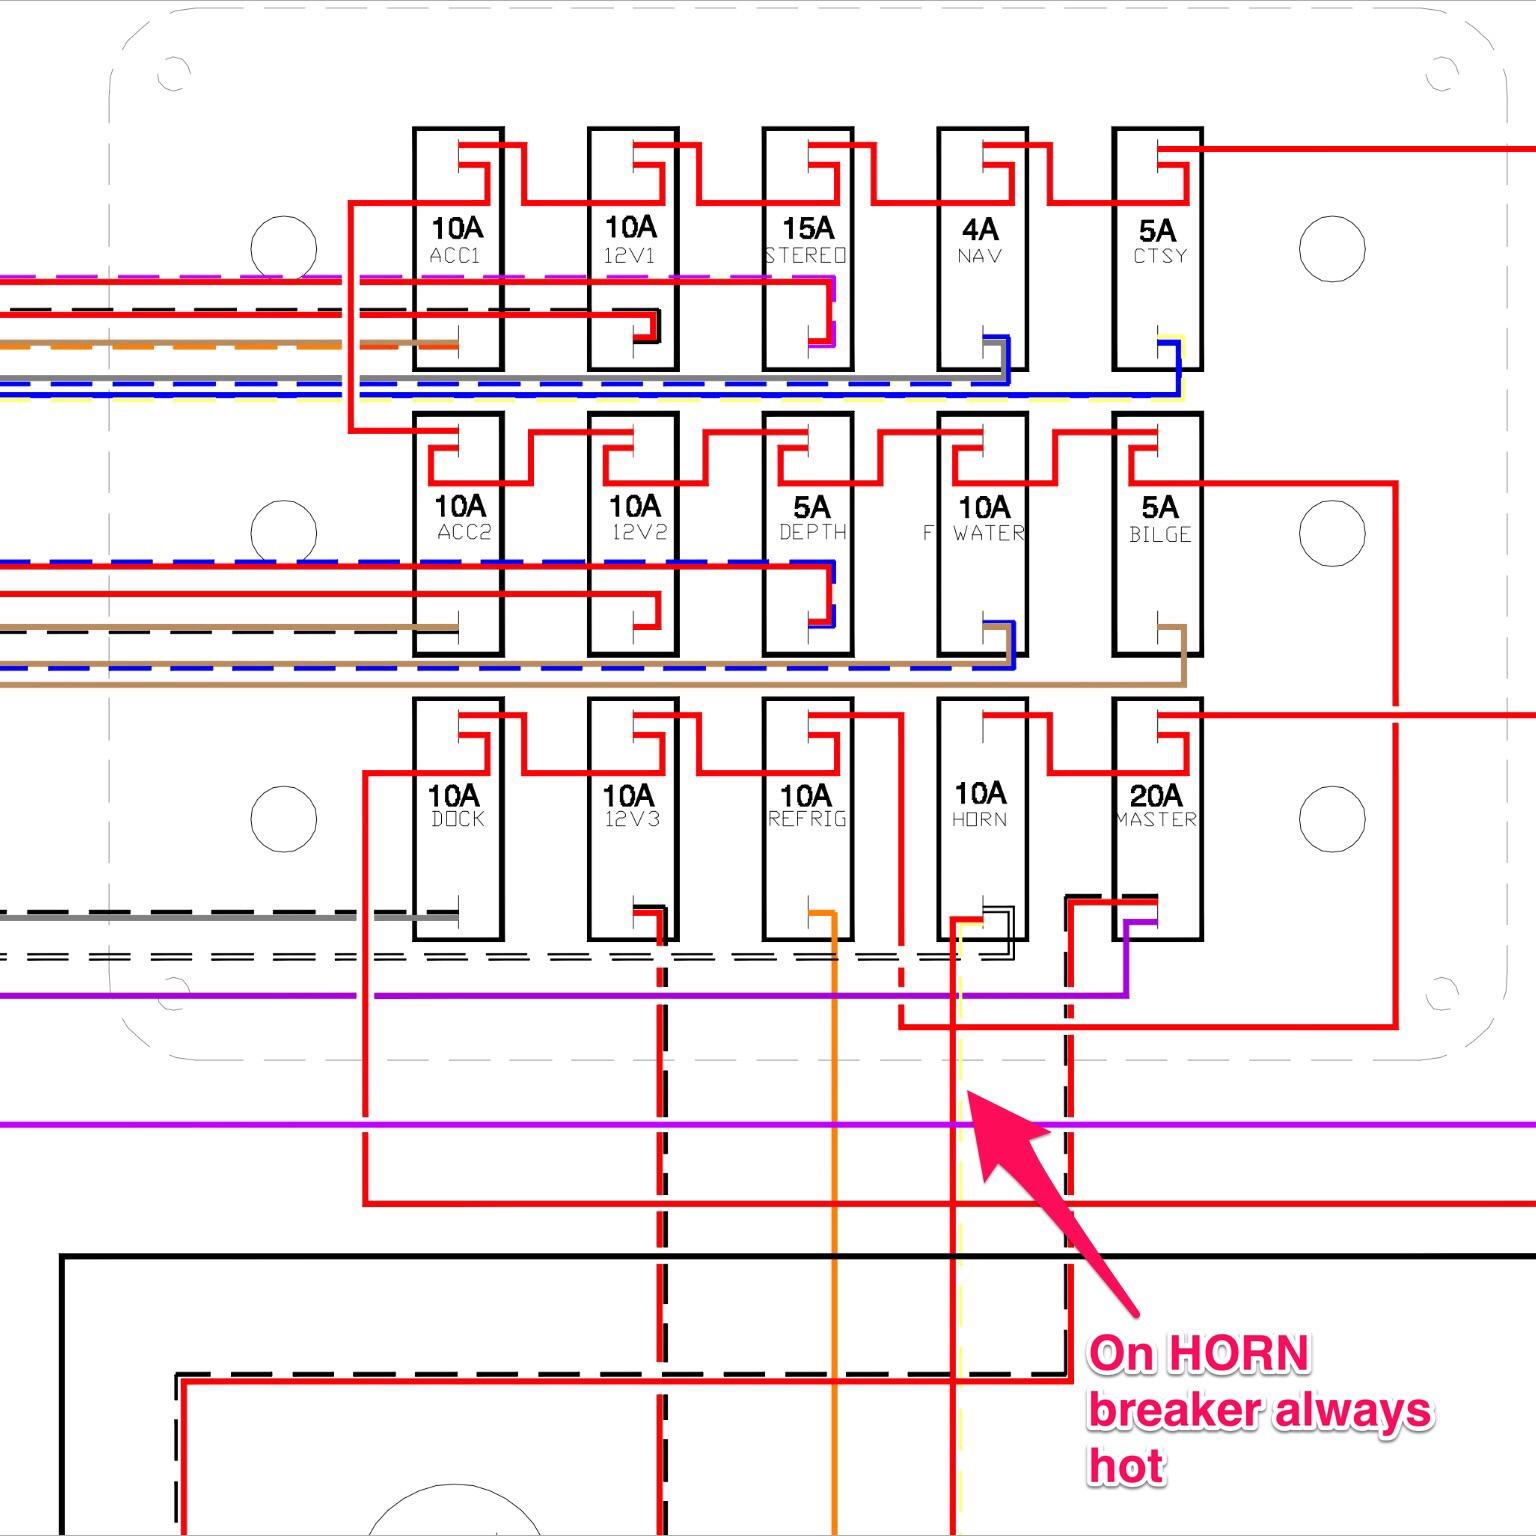 nsdycn1woofn?resize\\\\\\\=665%2C665\\\\\\\&ssl\\\\\\\=1 wiring diagram kenwood kdc 610u color wiring diagram images kenwood kdc 610u wiring diagram at edmiracle.co